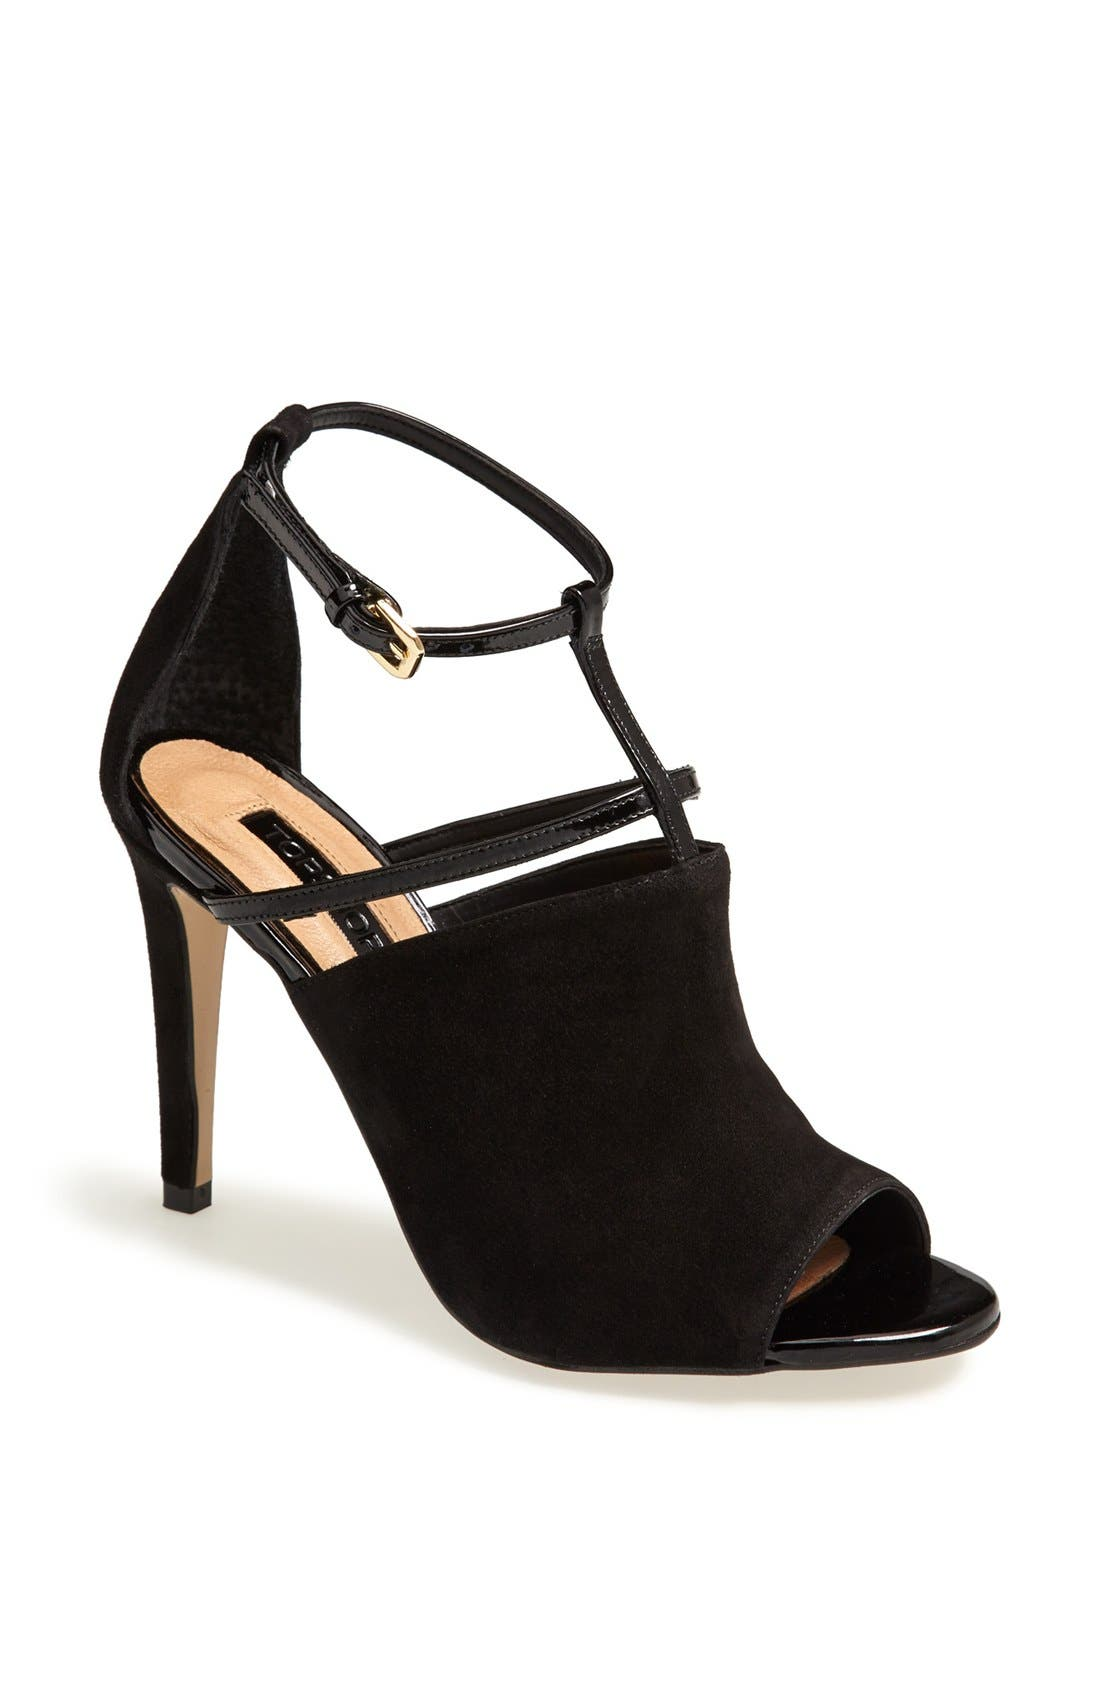 Main Image - Topshop 'Gamos' Leather Sandal